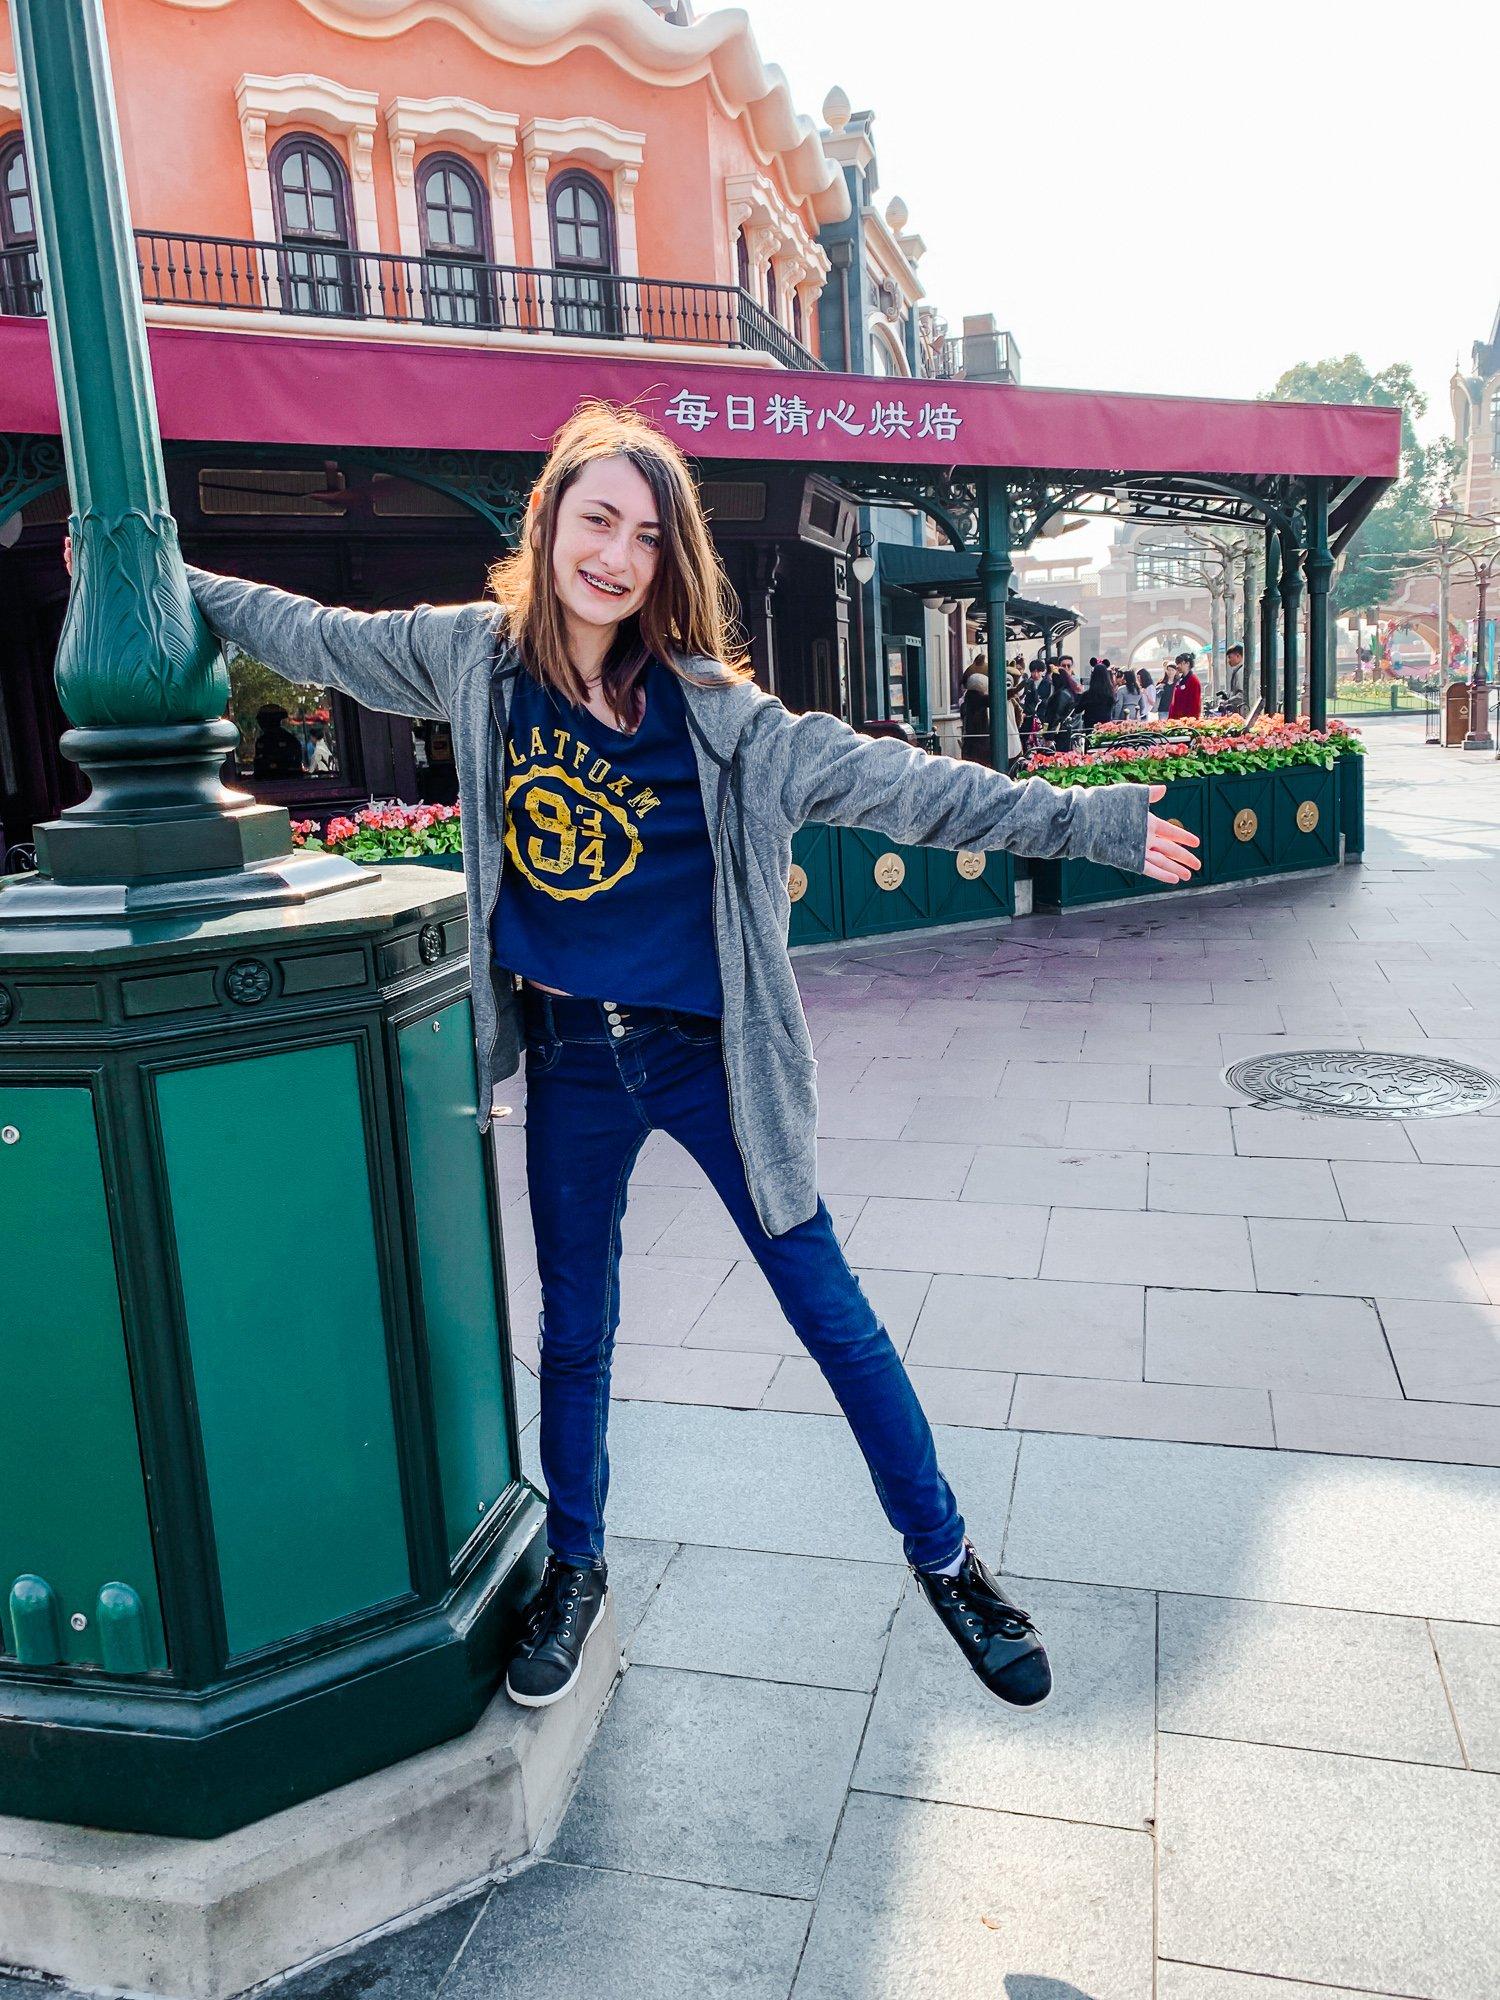 Teen at Shanghai Disneyland